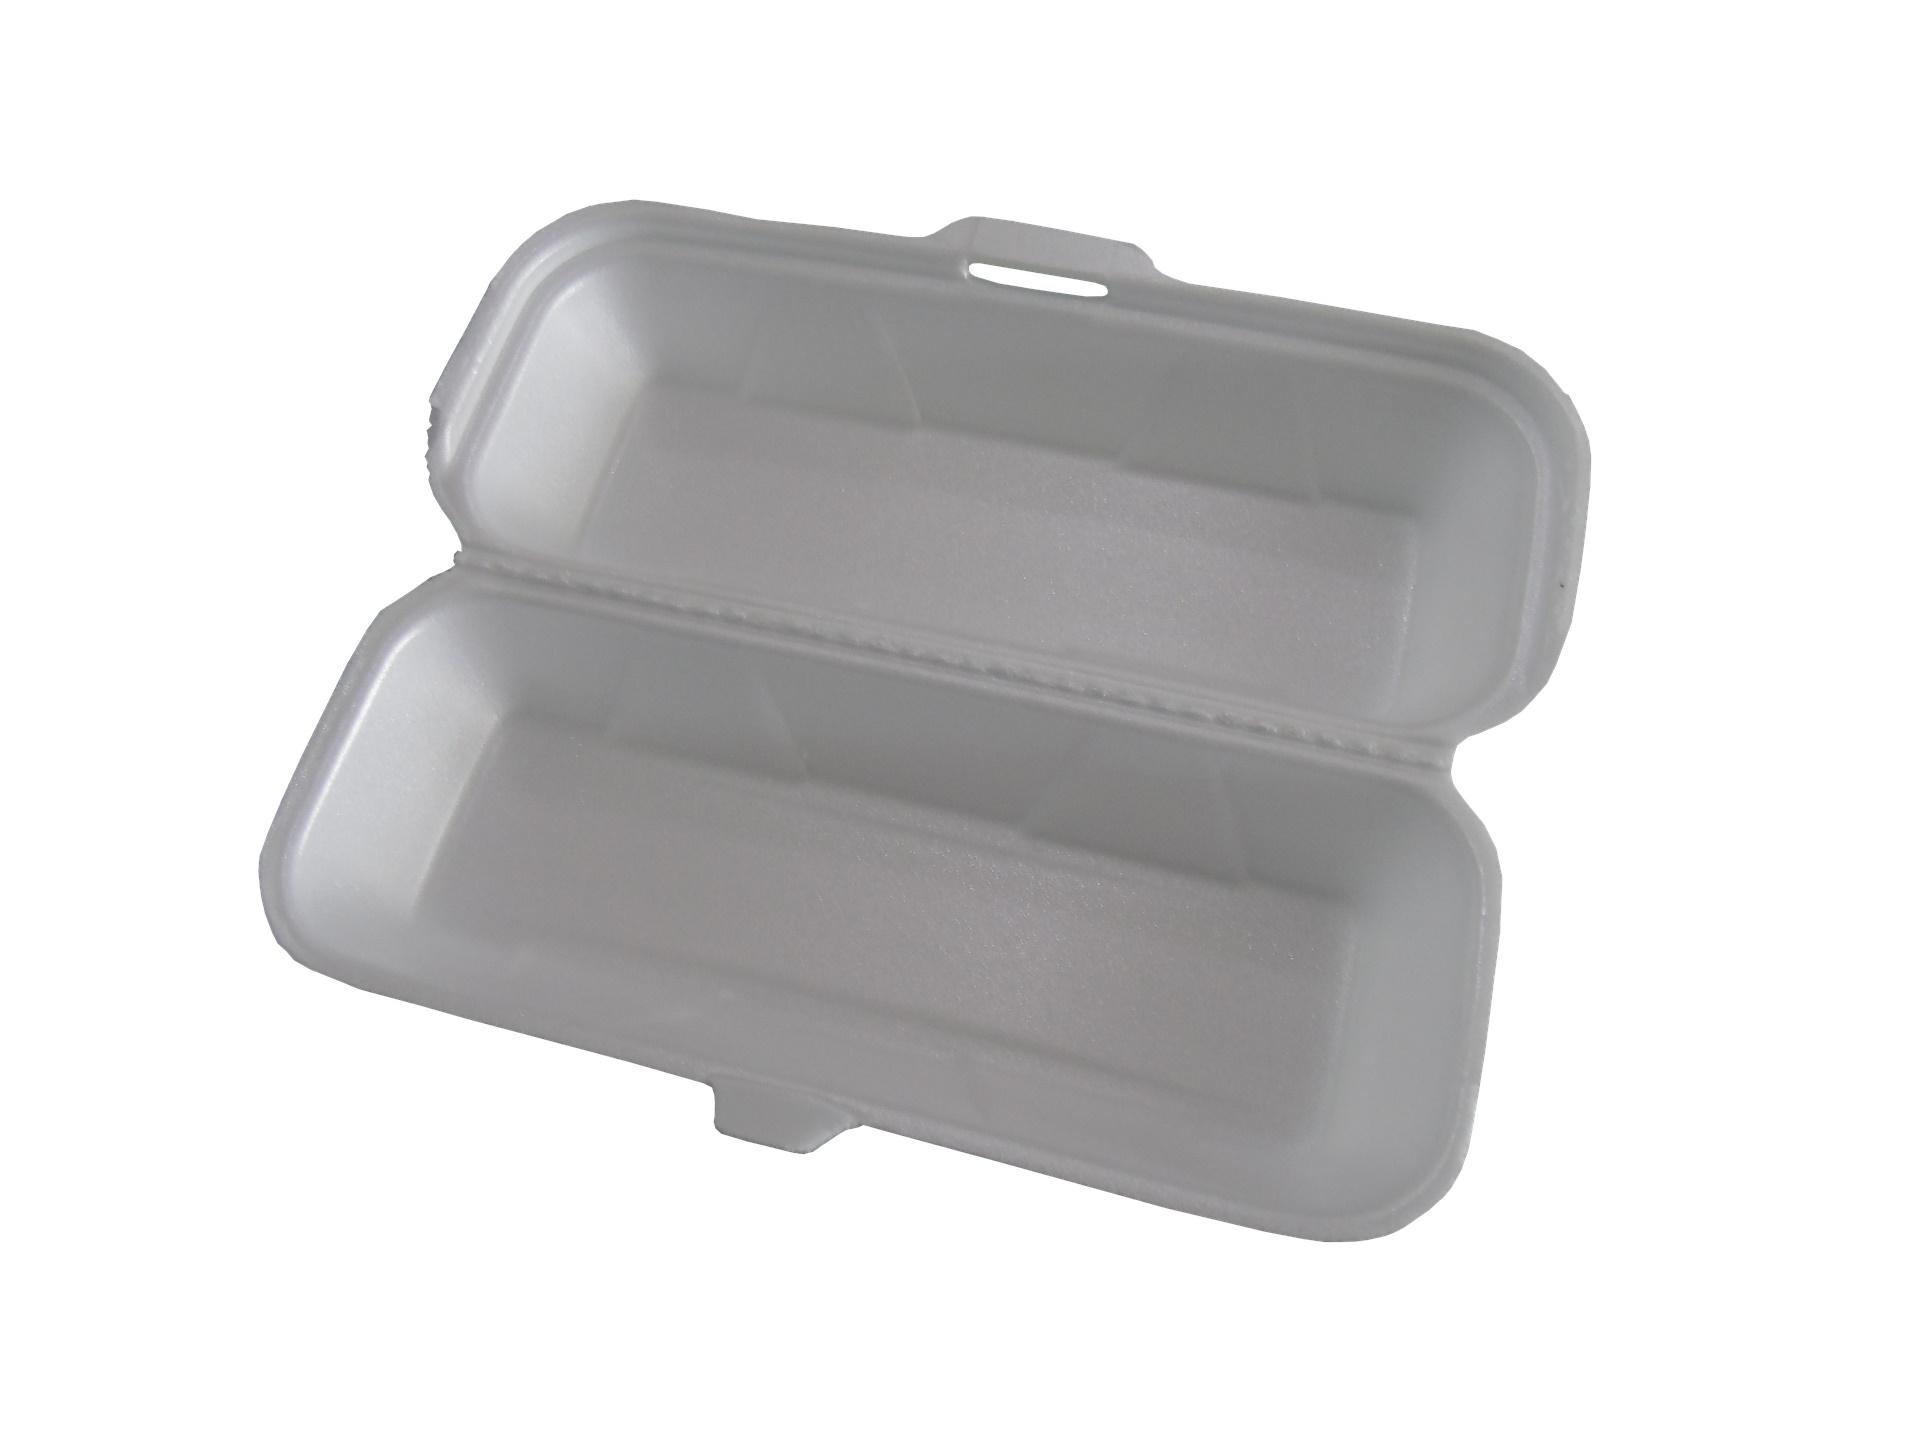 Styrofoam foam container. (Pixabay License).